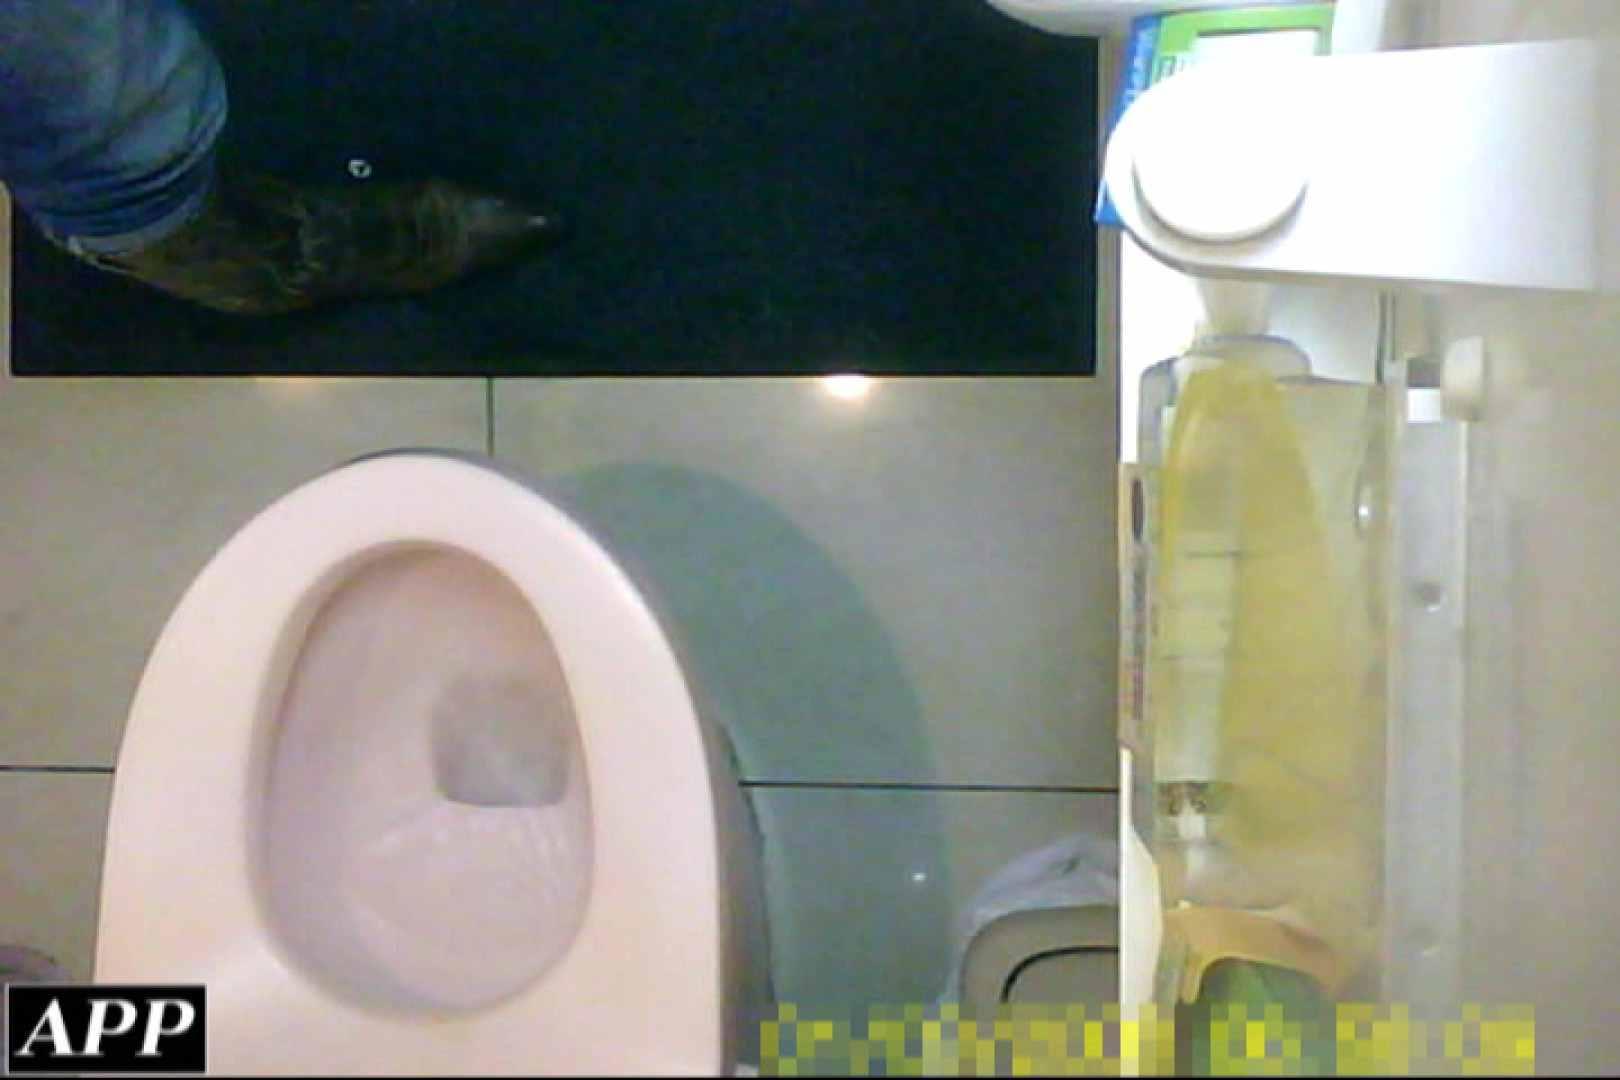 3視点洗面所 vol.037 洗面所 | OLセックス  49画像 9